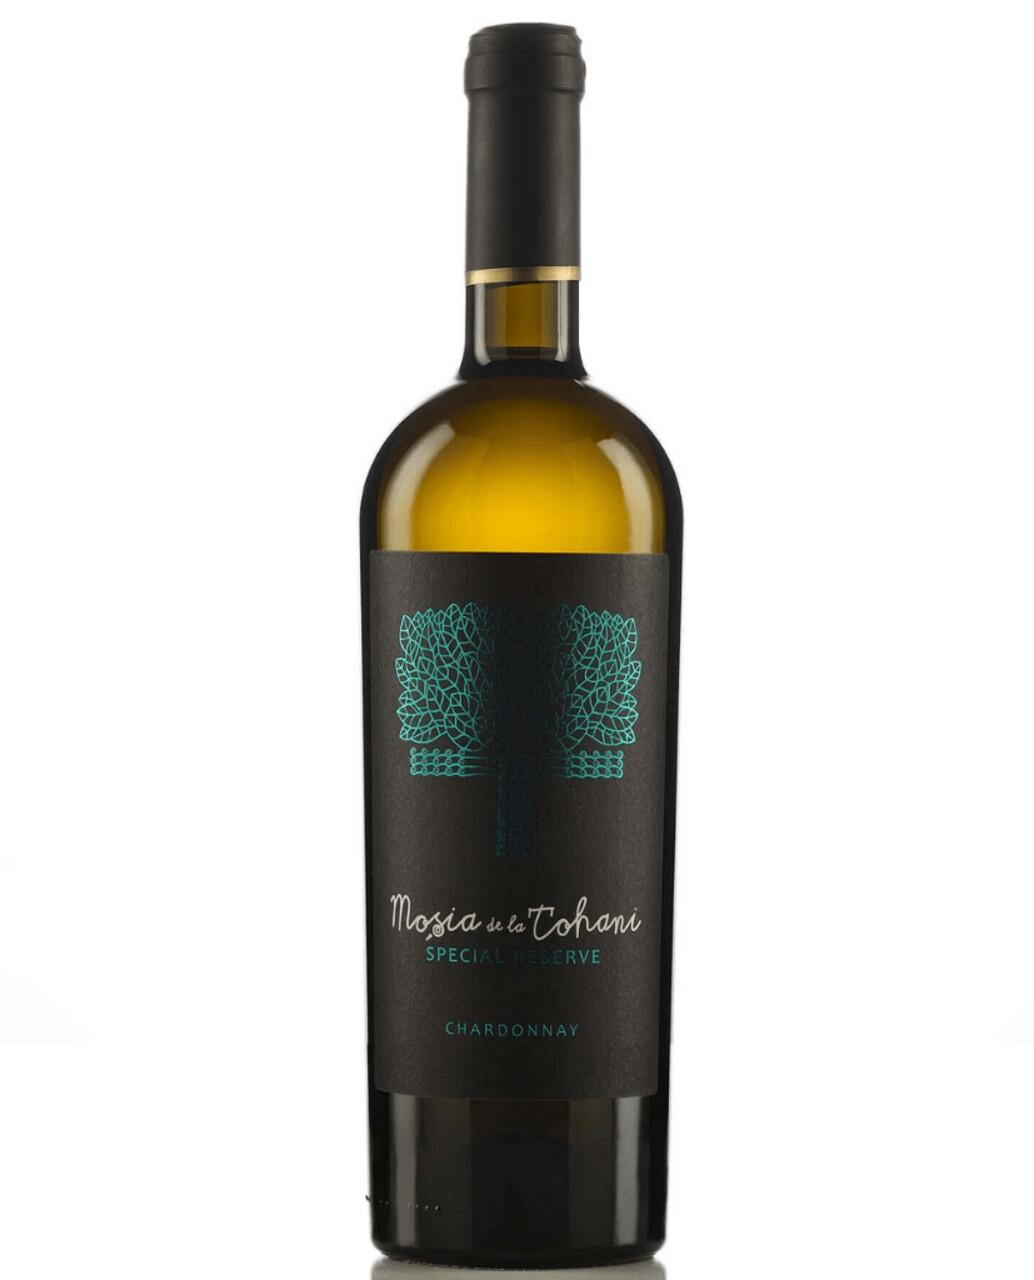 Mosia de la Tohani Special Reserve Chardonnay